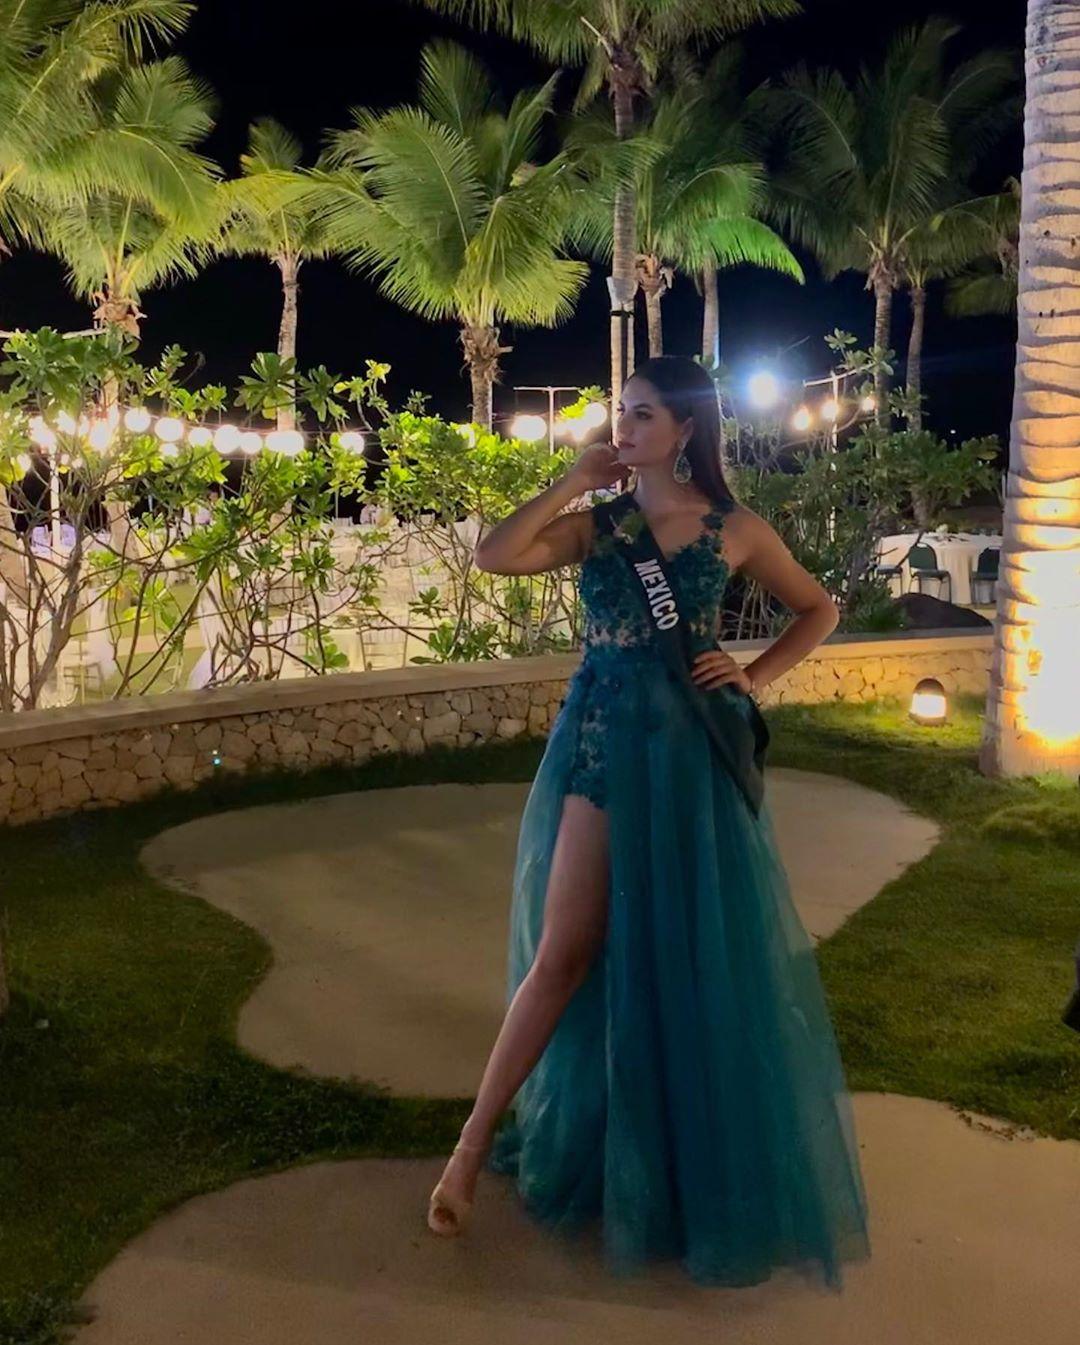 hilary islas, miss earth mexico 2019. - Página 16 71527611